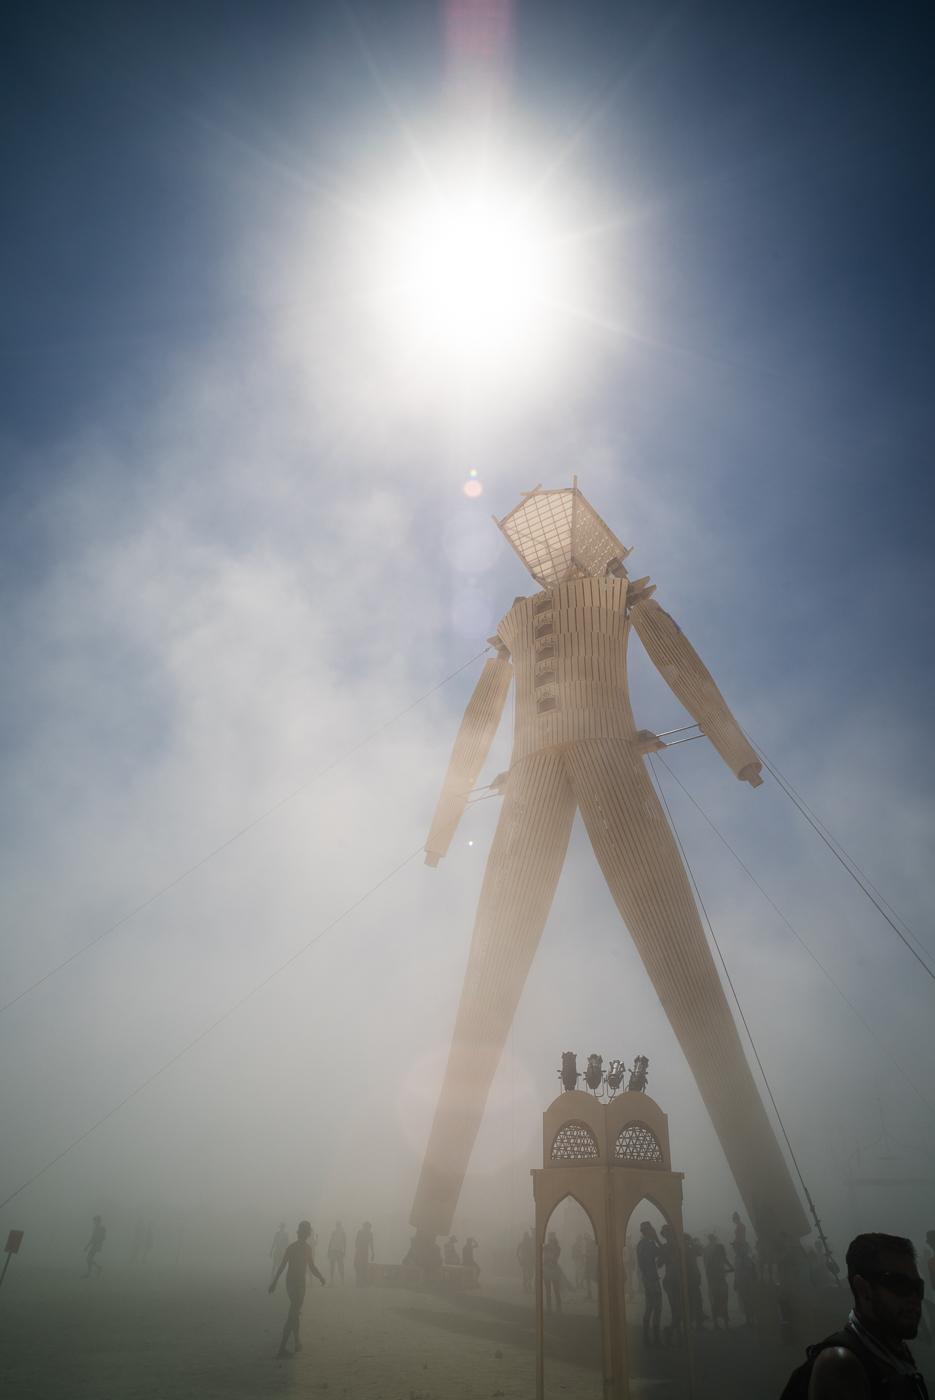 The Dusty Man, Burning Man 2014: In Dust We Trust - Photos of a Dusty Playa